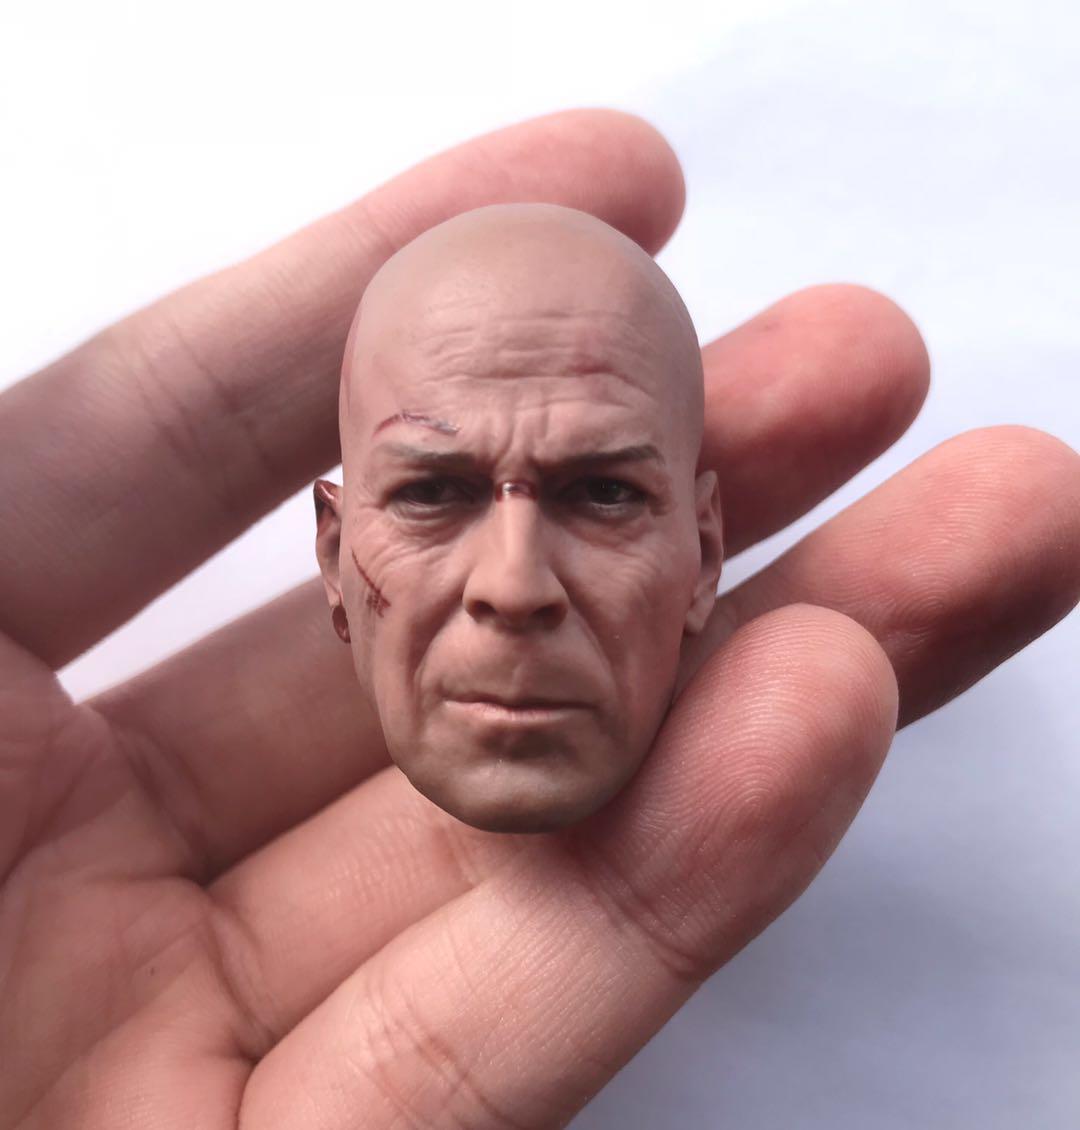 1//6 Bruce Willis Head Sculpt For Die Hard 12'' Hottoys Figure Body